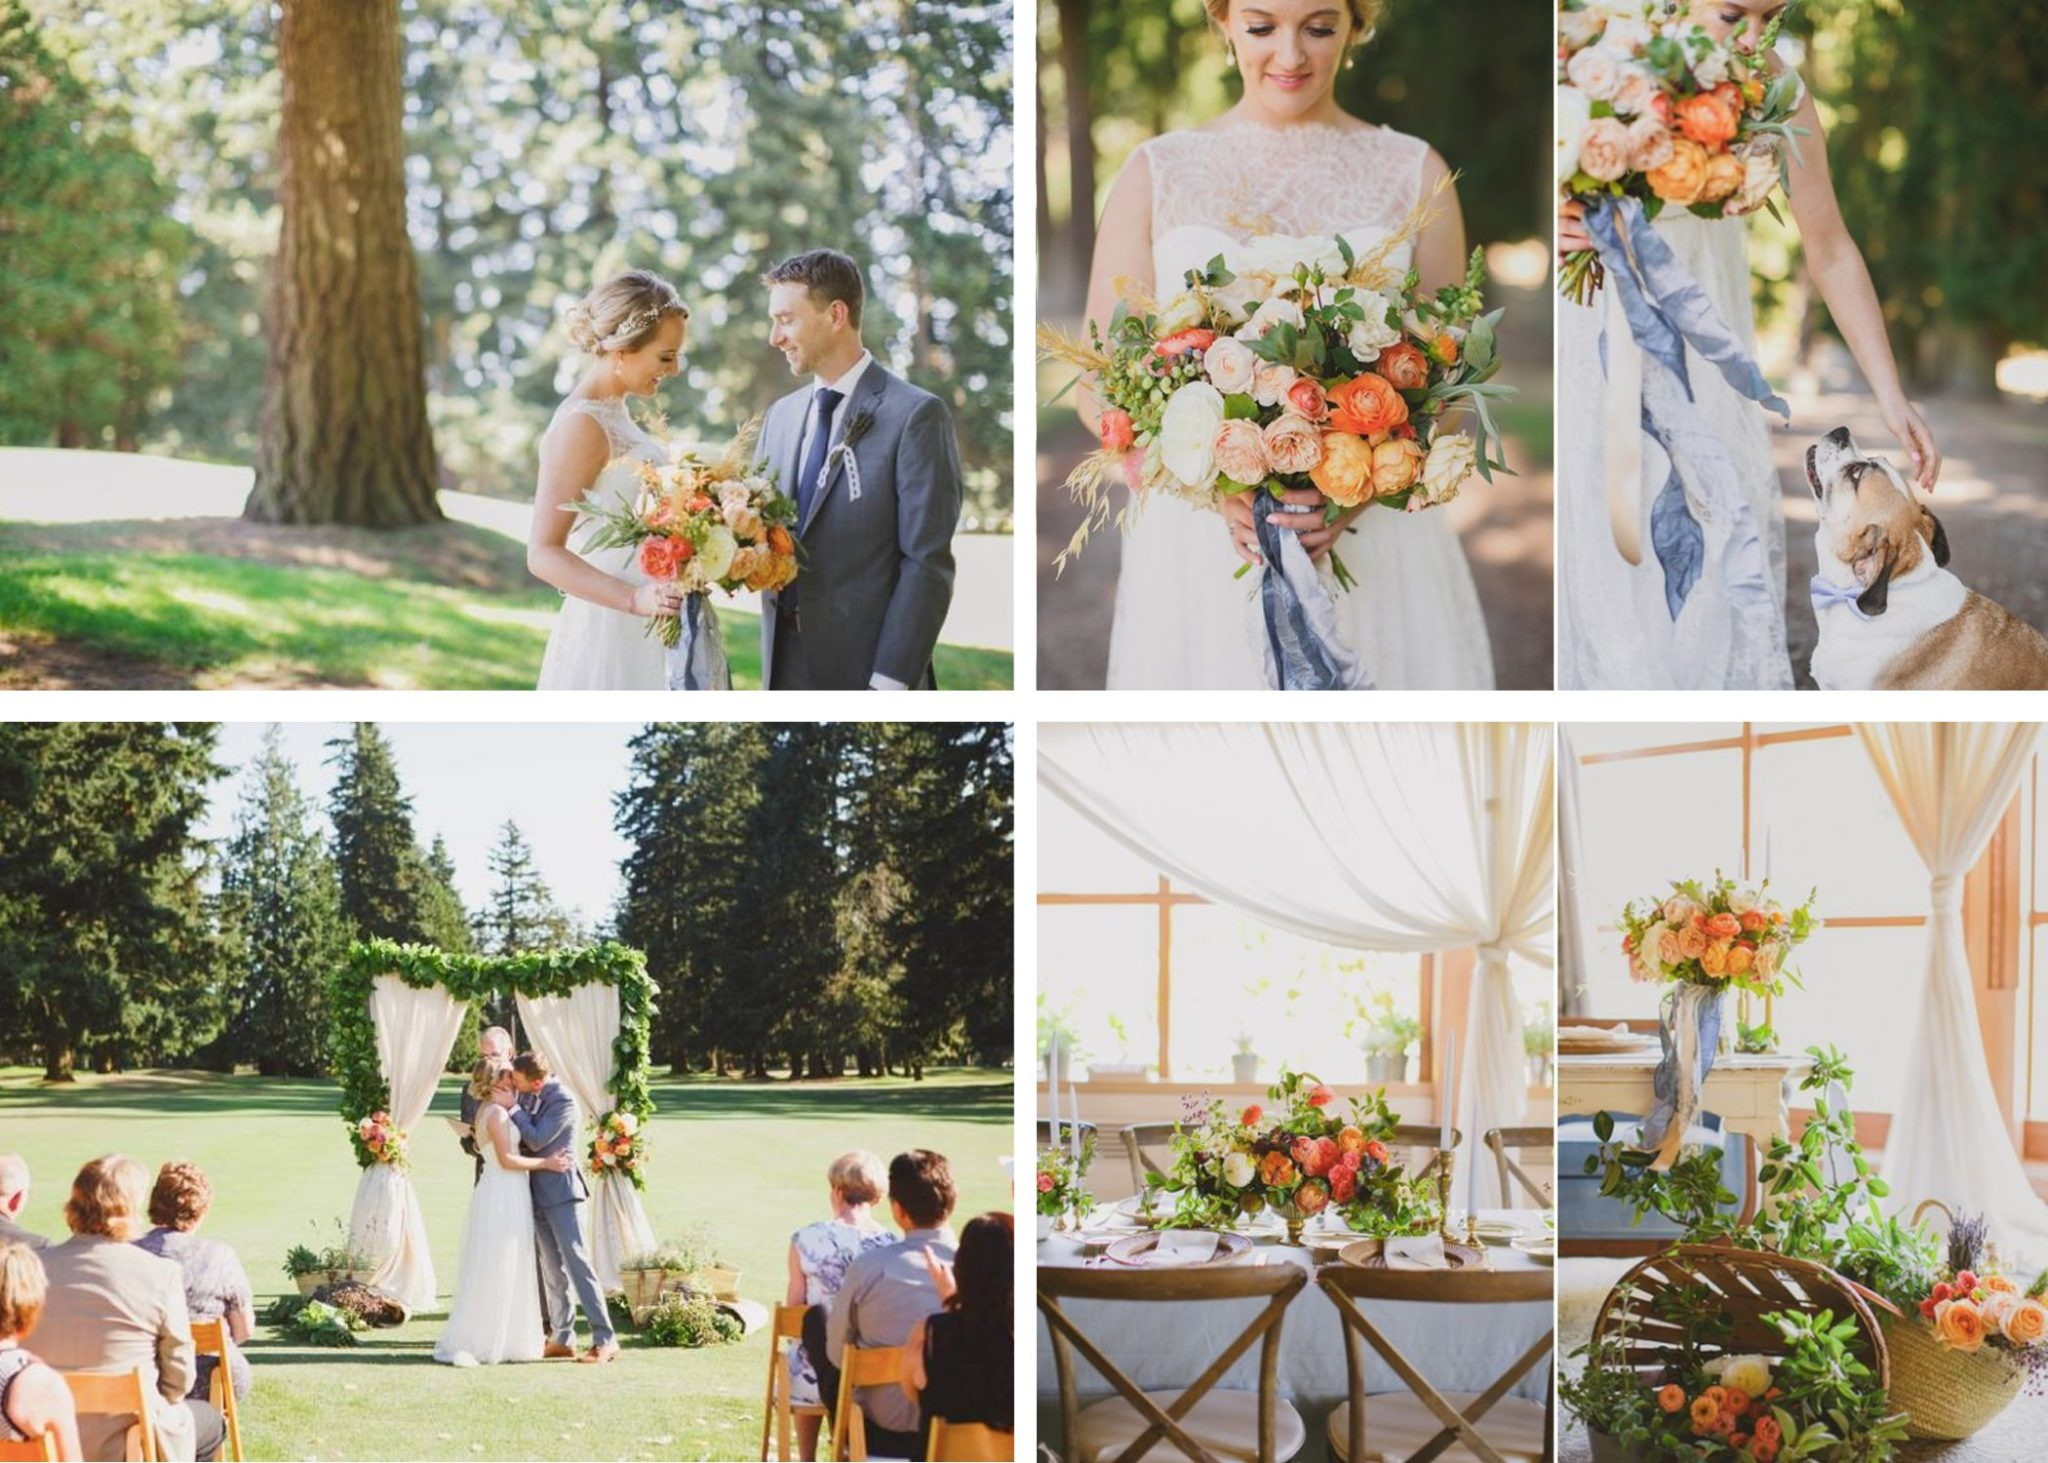 Finch Thistle Weddings E-Design Service Etsy